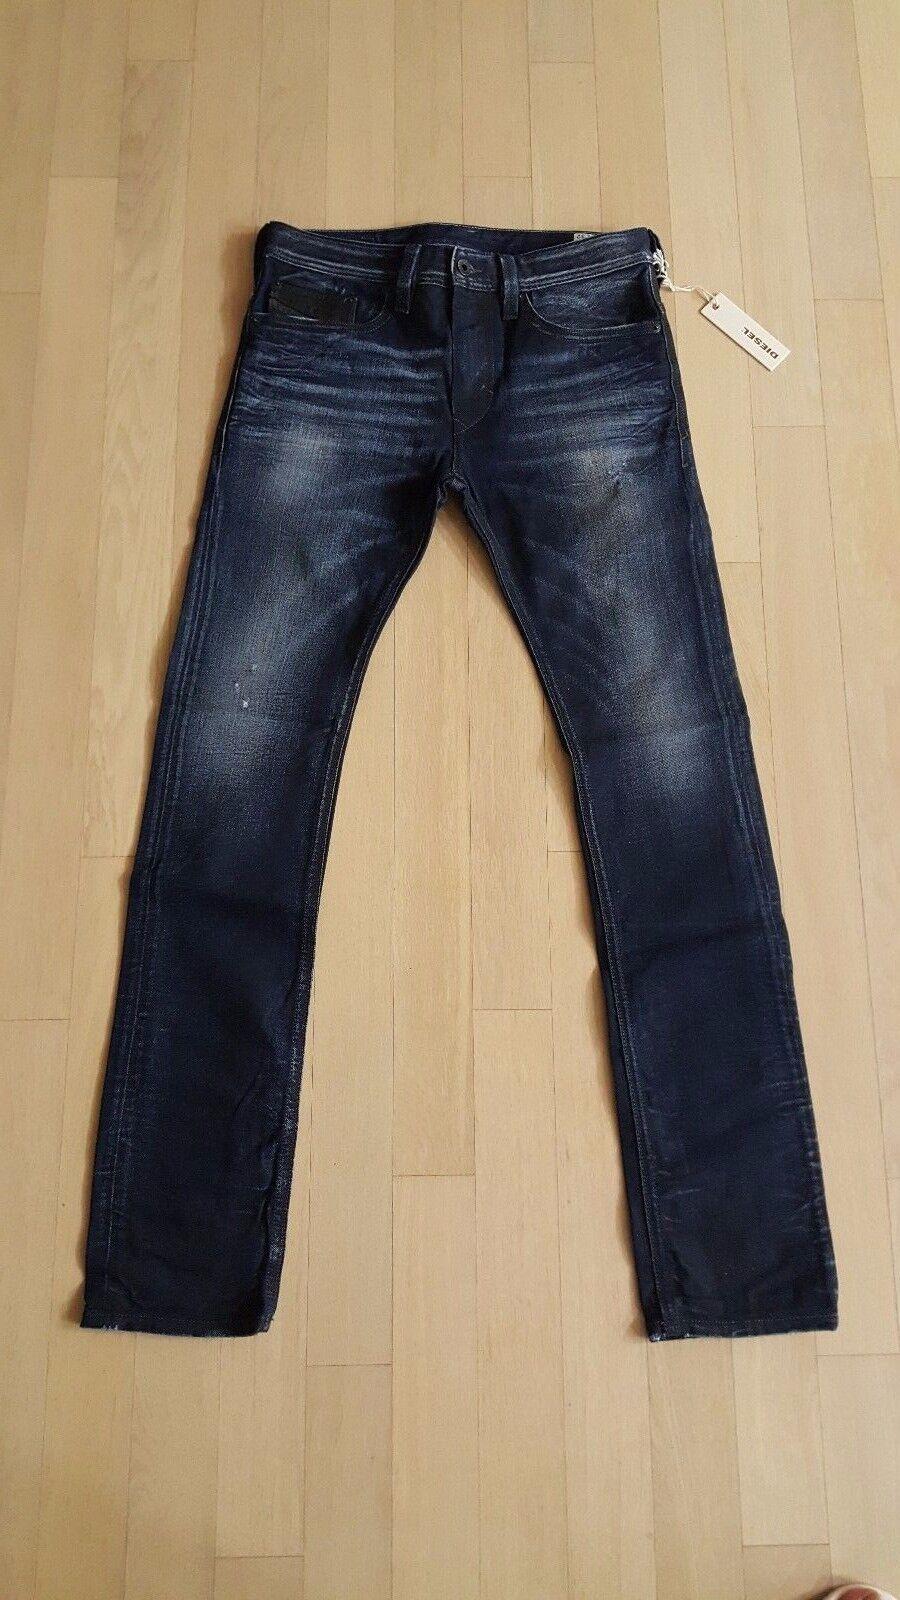 DIESEL THANAZ 880F 100% Authentic ITALY Slim Skinny Jeans